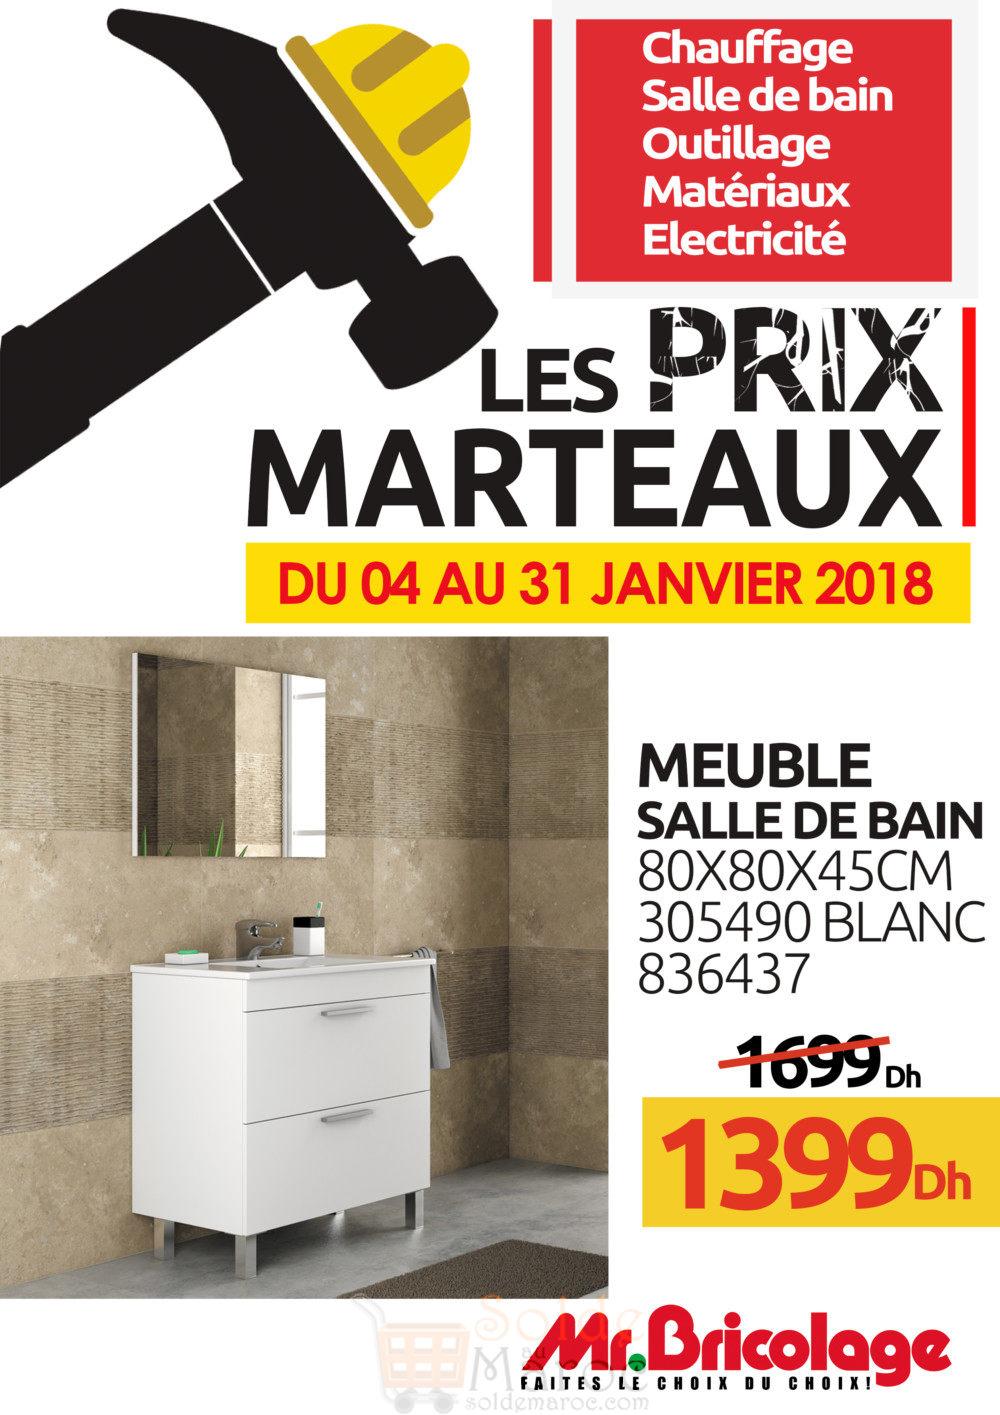 Soldes mr bricolage maroc meuble salle de bain 1399dhs - Mr bricolage salle de bain ...